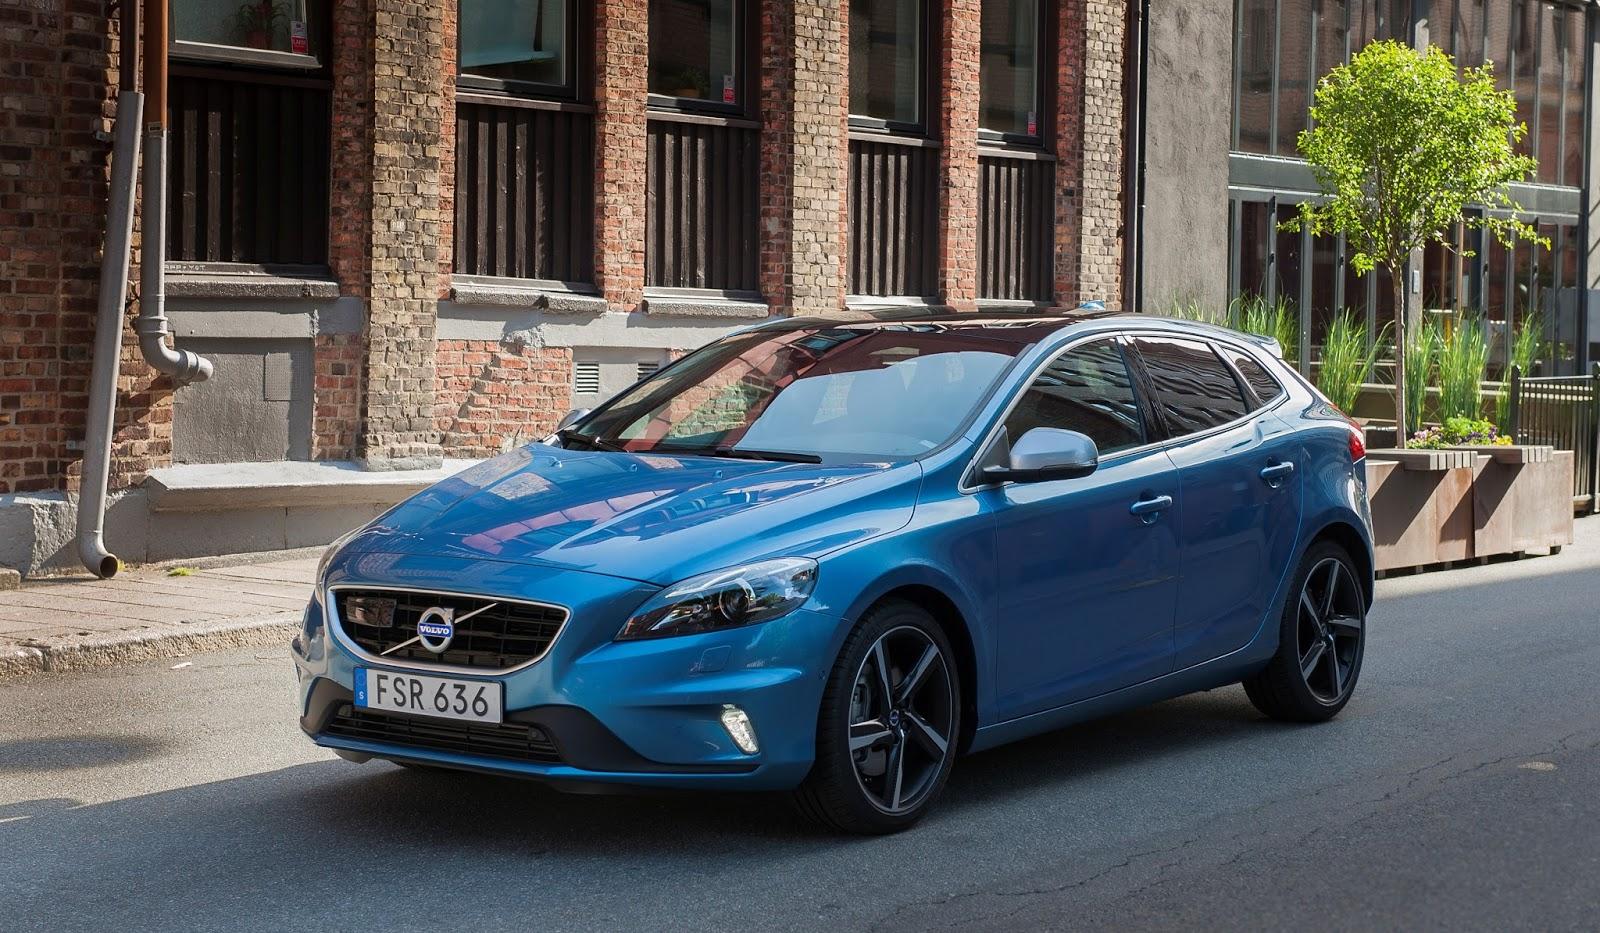 VOLVO%2BV40%2B1.5%2BT3%2BAUTO 5 Το Volvo V40 Cross Country με το νέο κινητήρα 1,5 λίτρων, απόδοσης 152 ίππων από 21.900 €